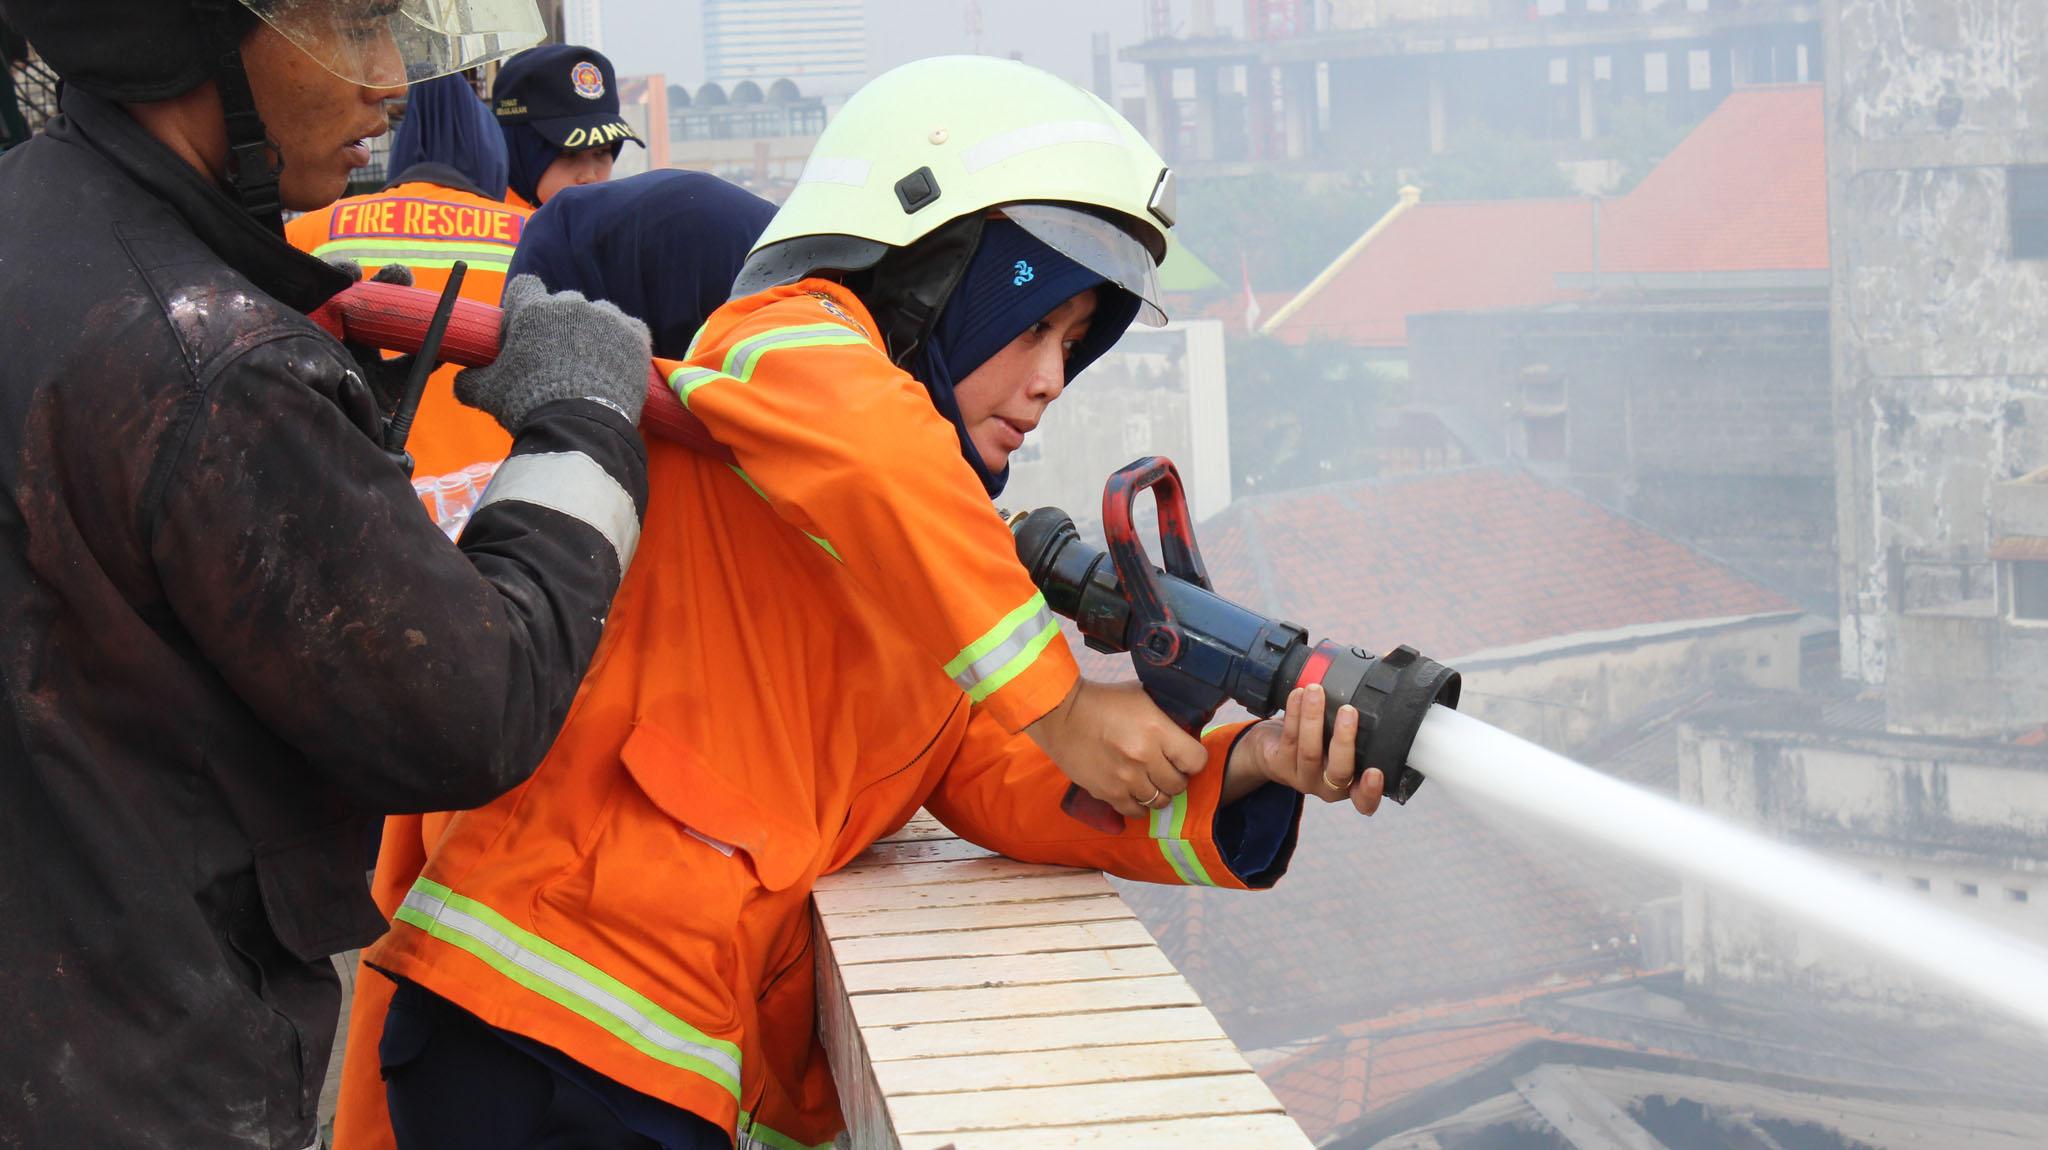 63 Koleksi Gambar Kata Bijak Pemadam Kebakaran HD Terbaik